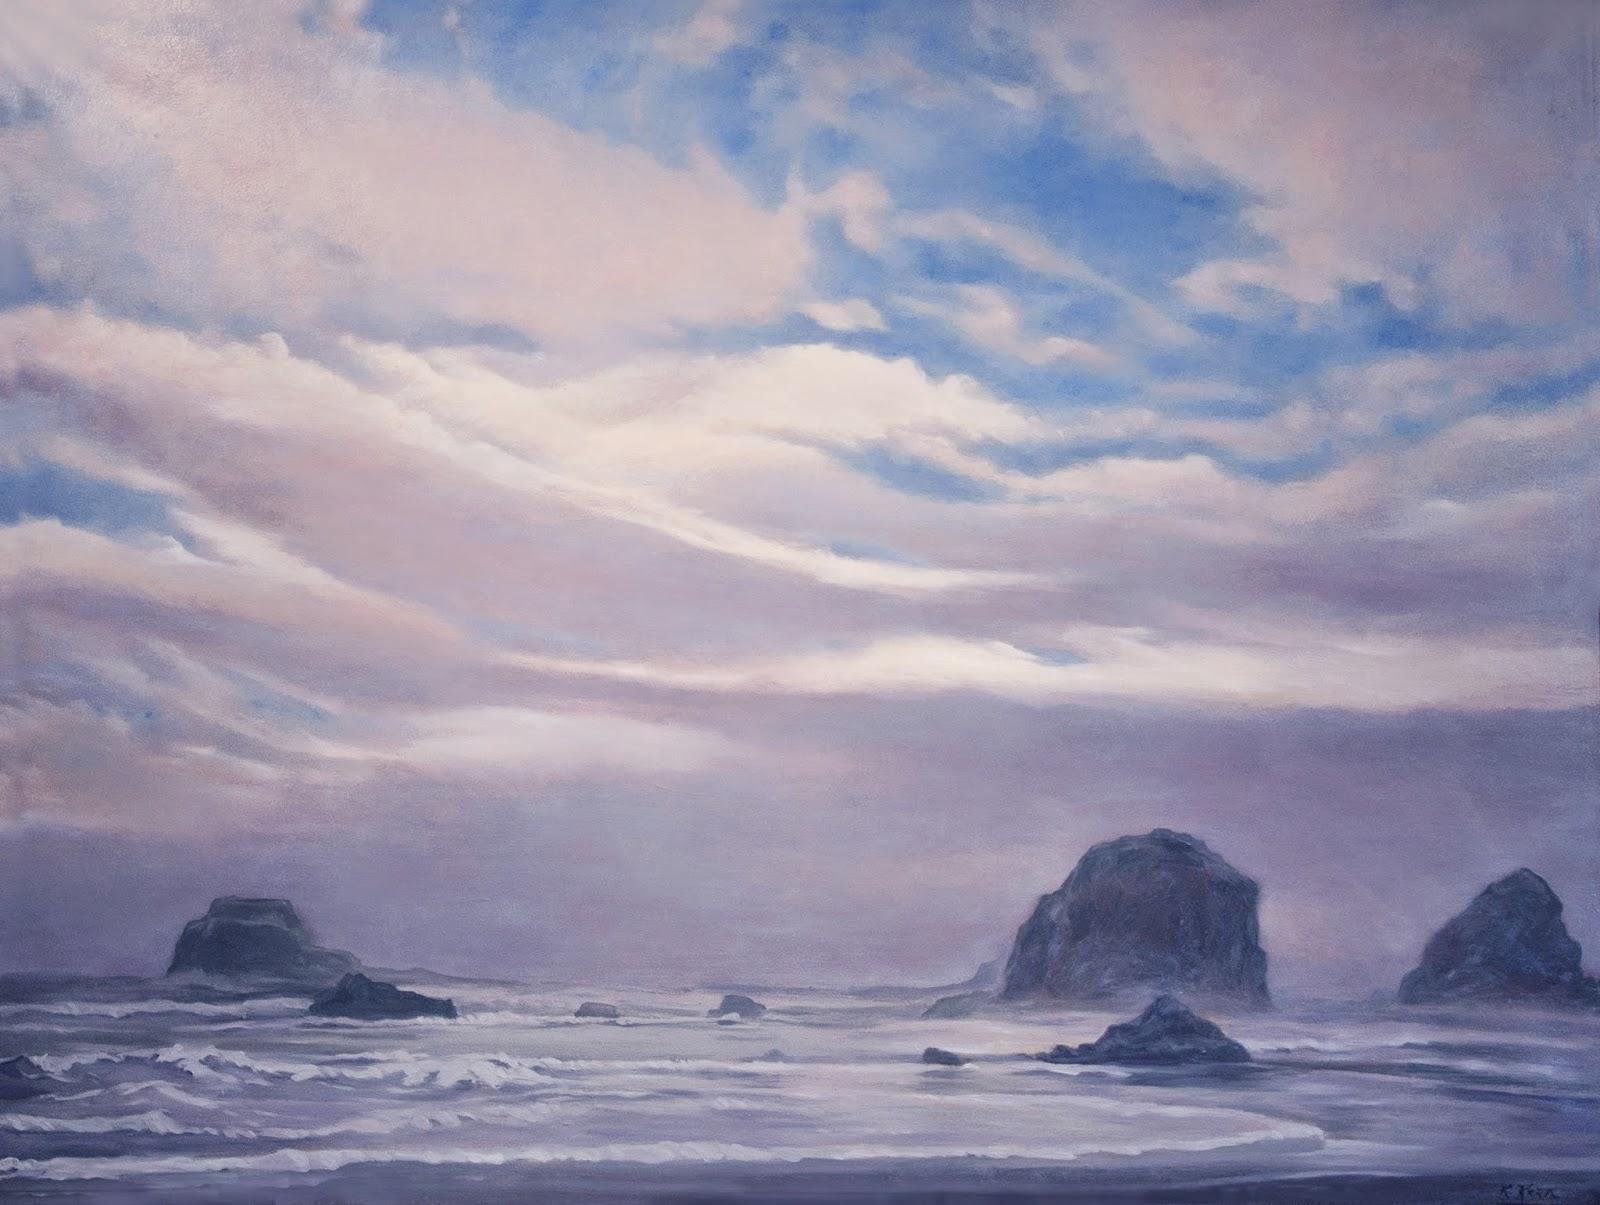 Fog Lifting Katherine Kean oil on linen 30 x 40 inches, healing art, tranquil art